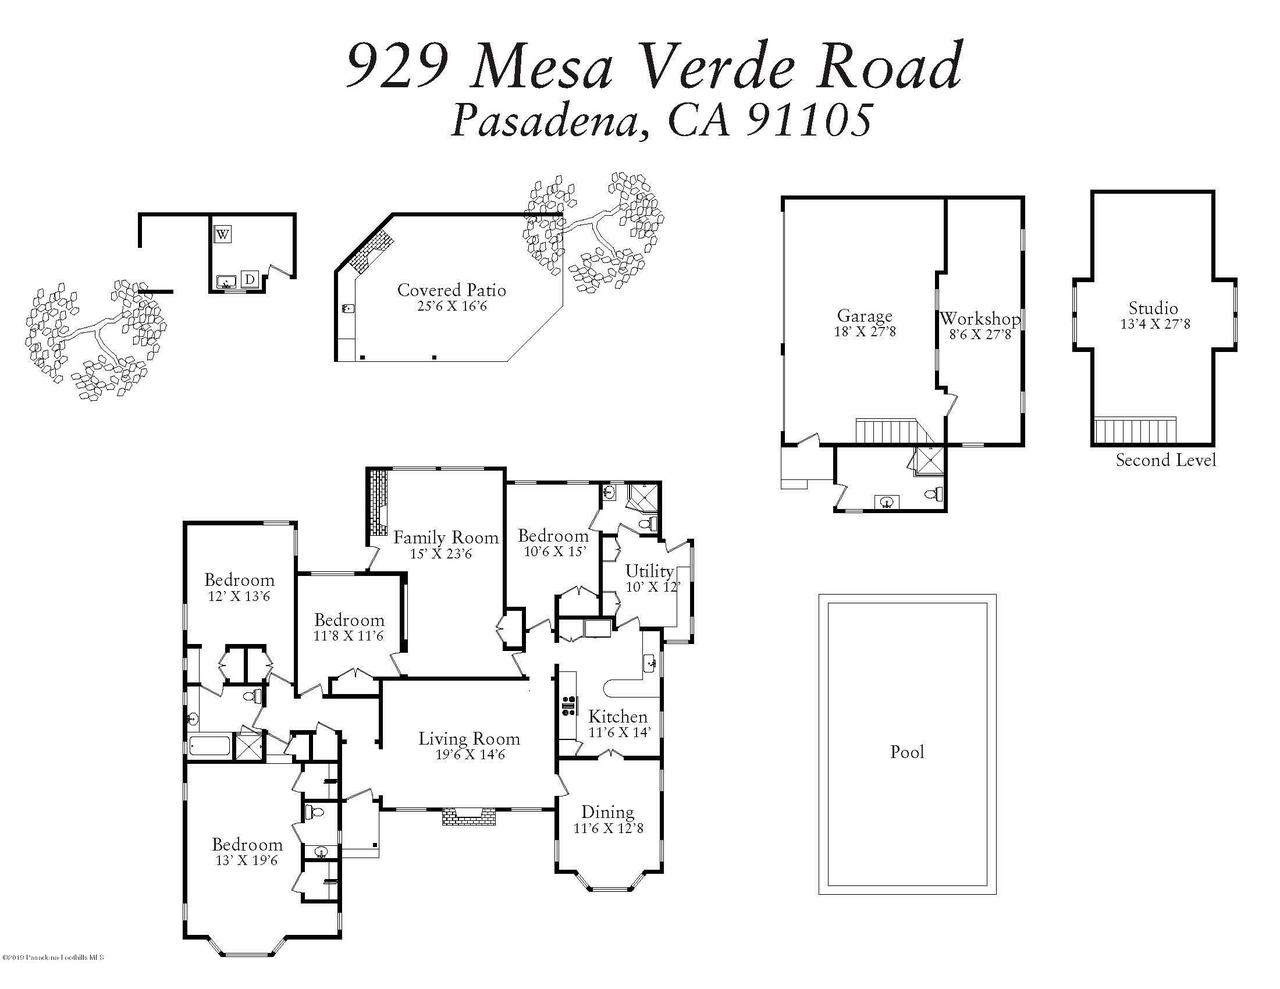 929 MESA VERDE, Pasadena, CA 91105 - Floor Plan